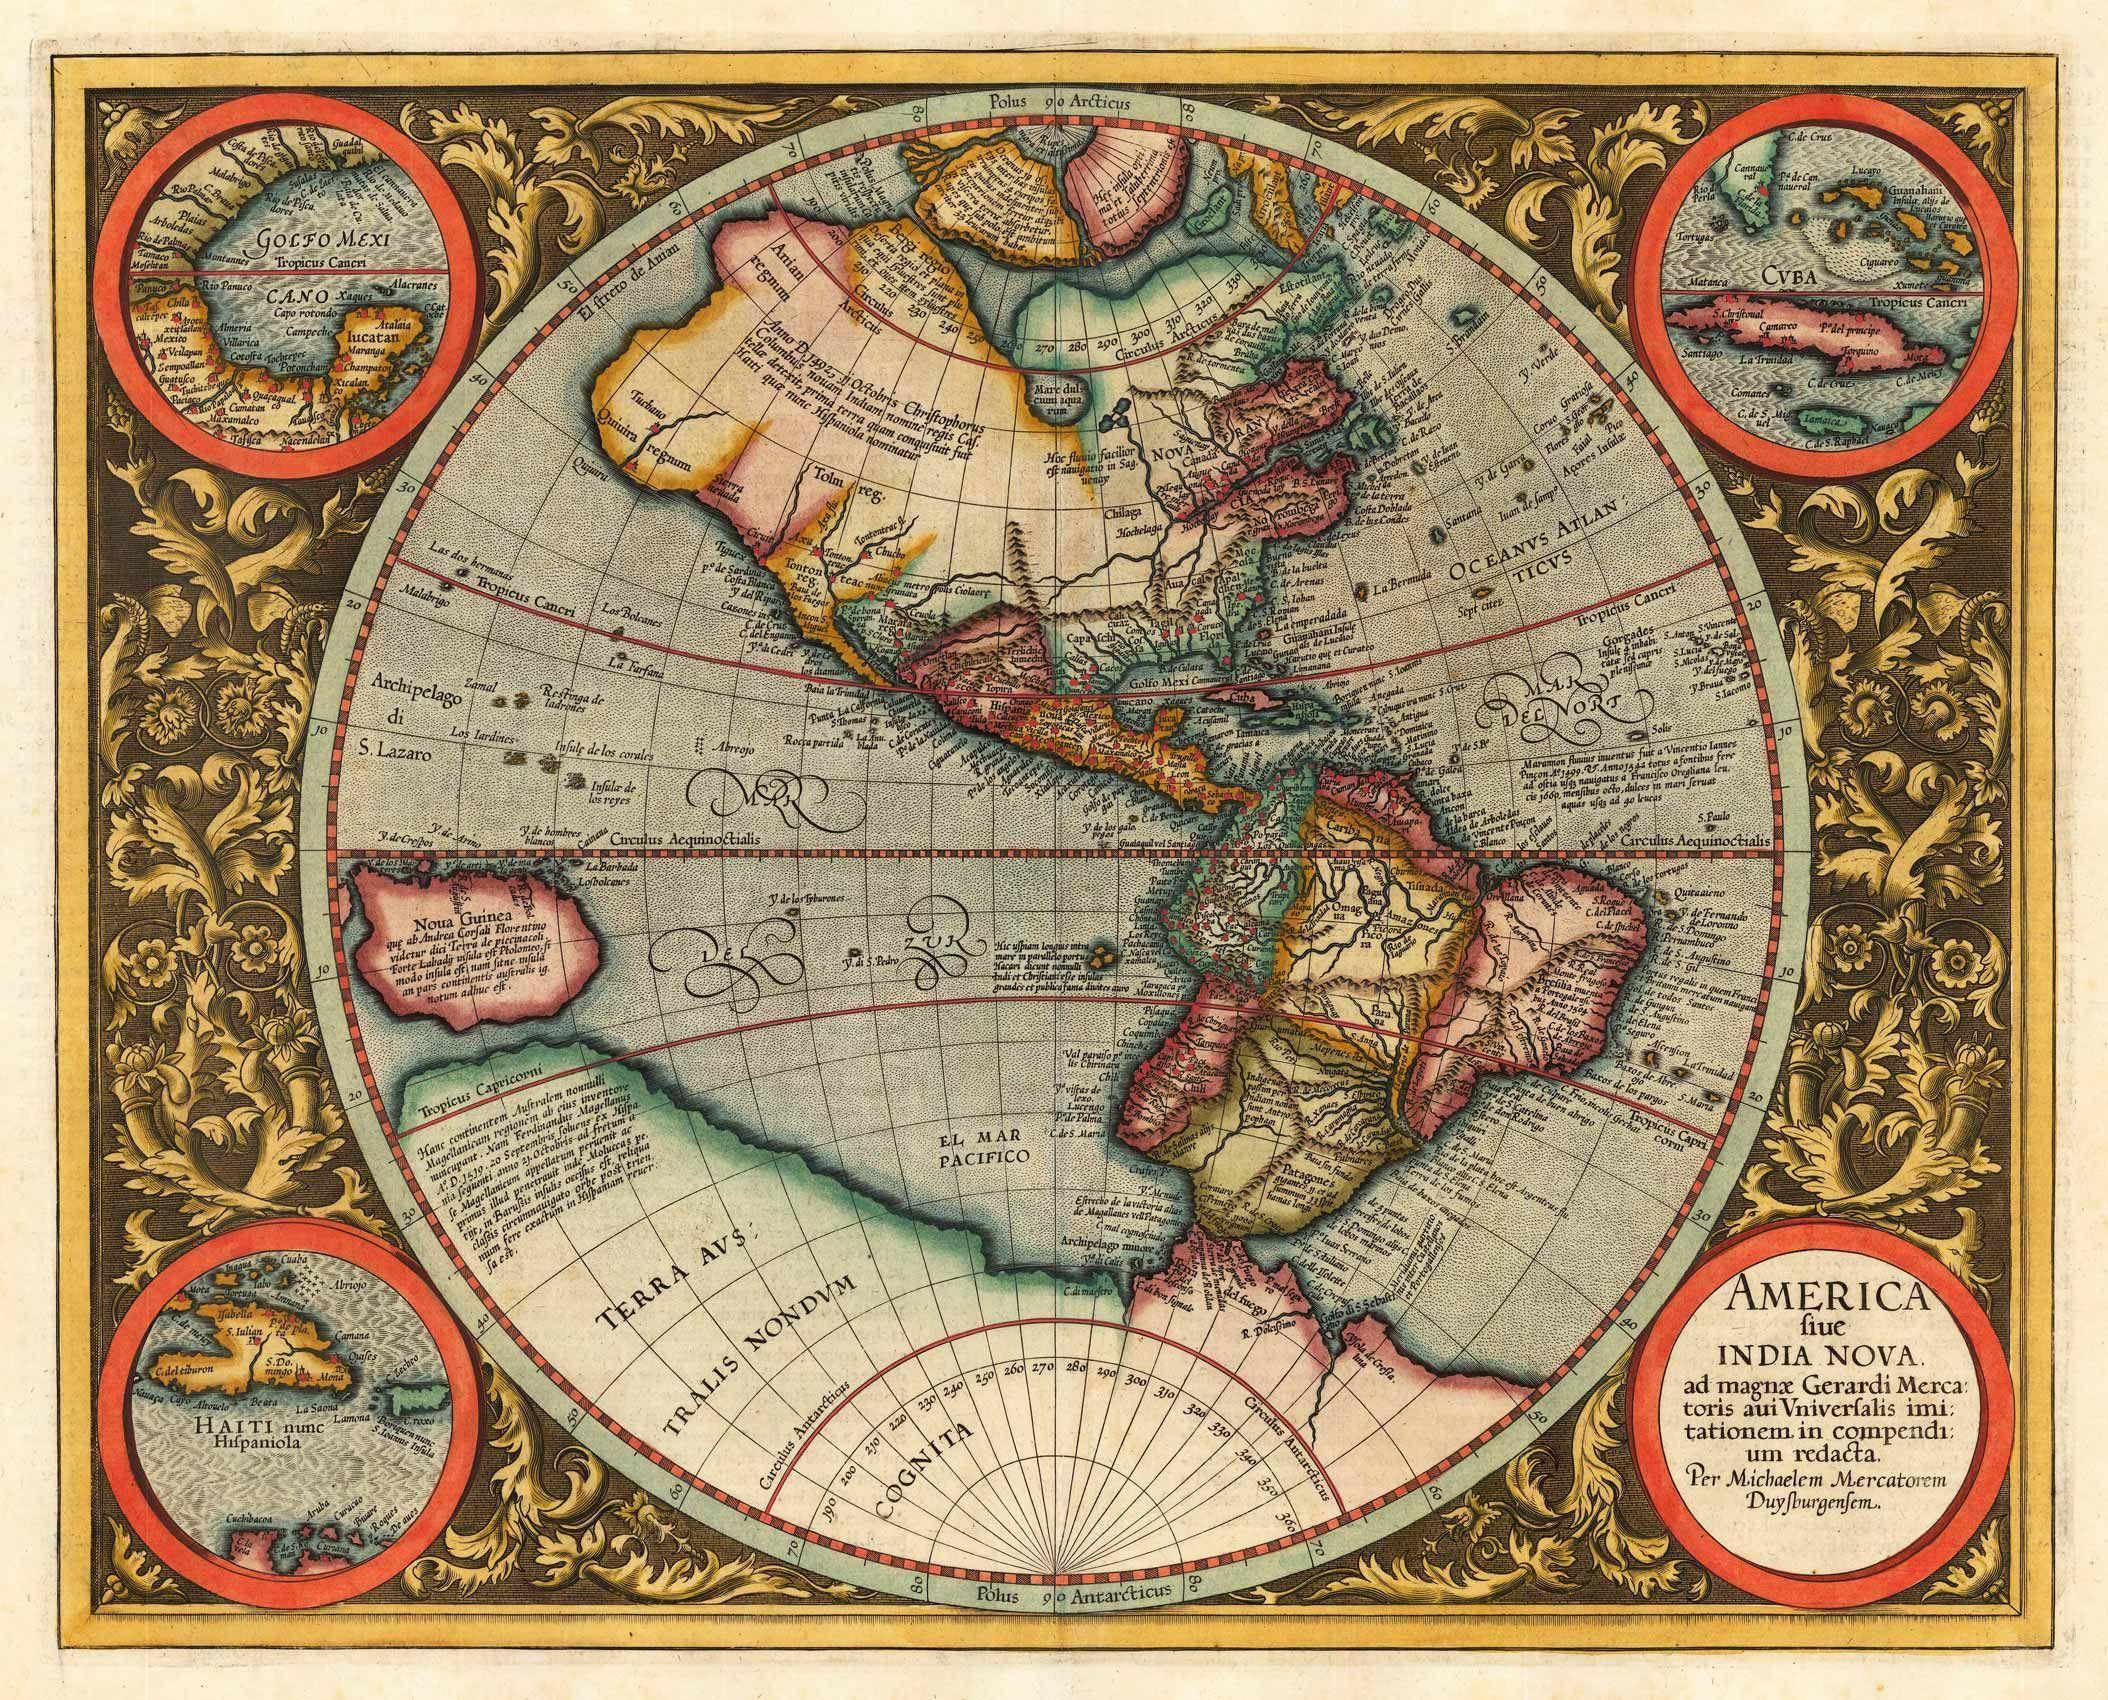 1595 America or New India Gerard Mercator